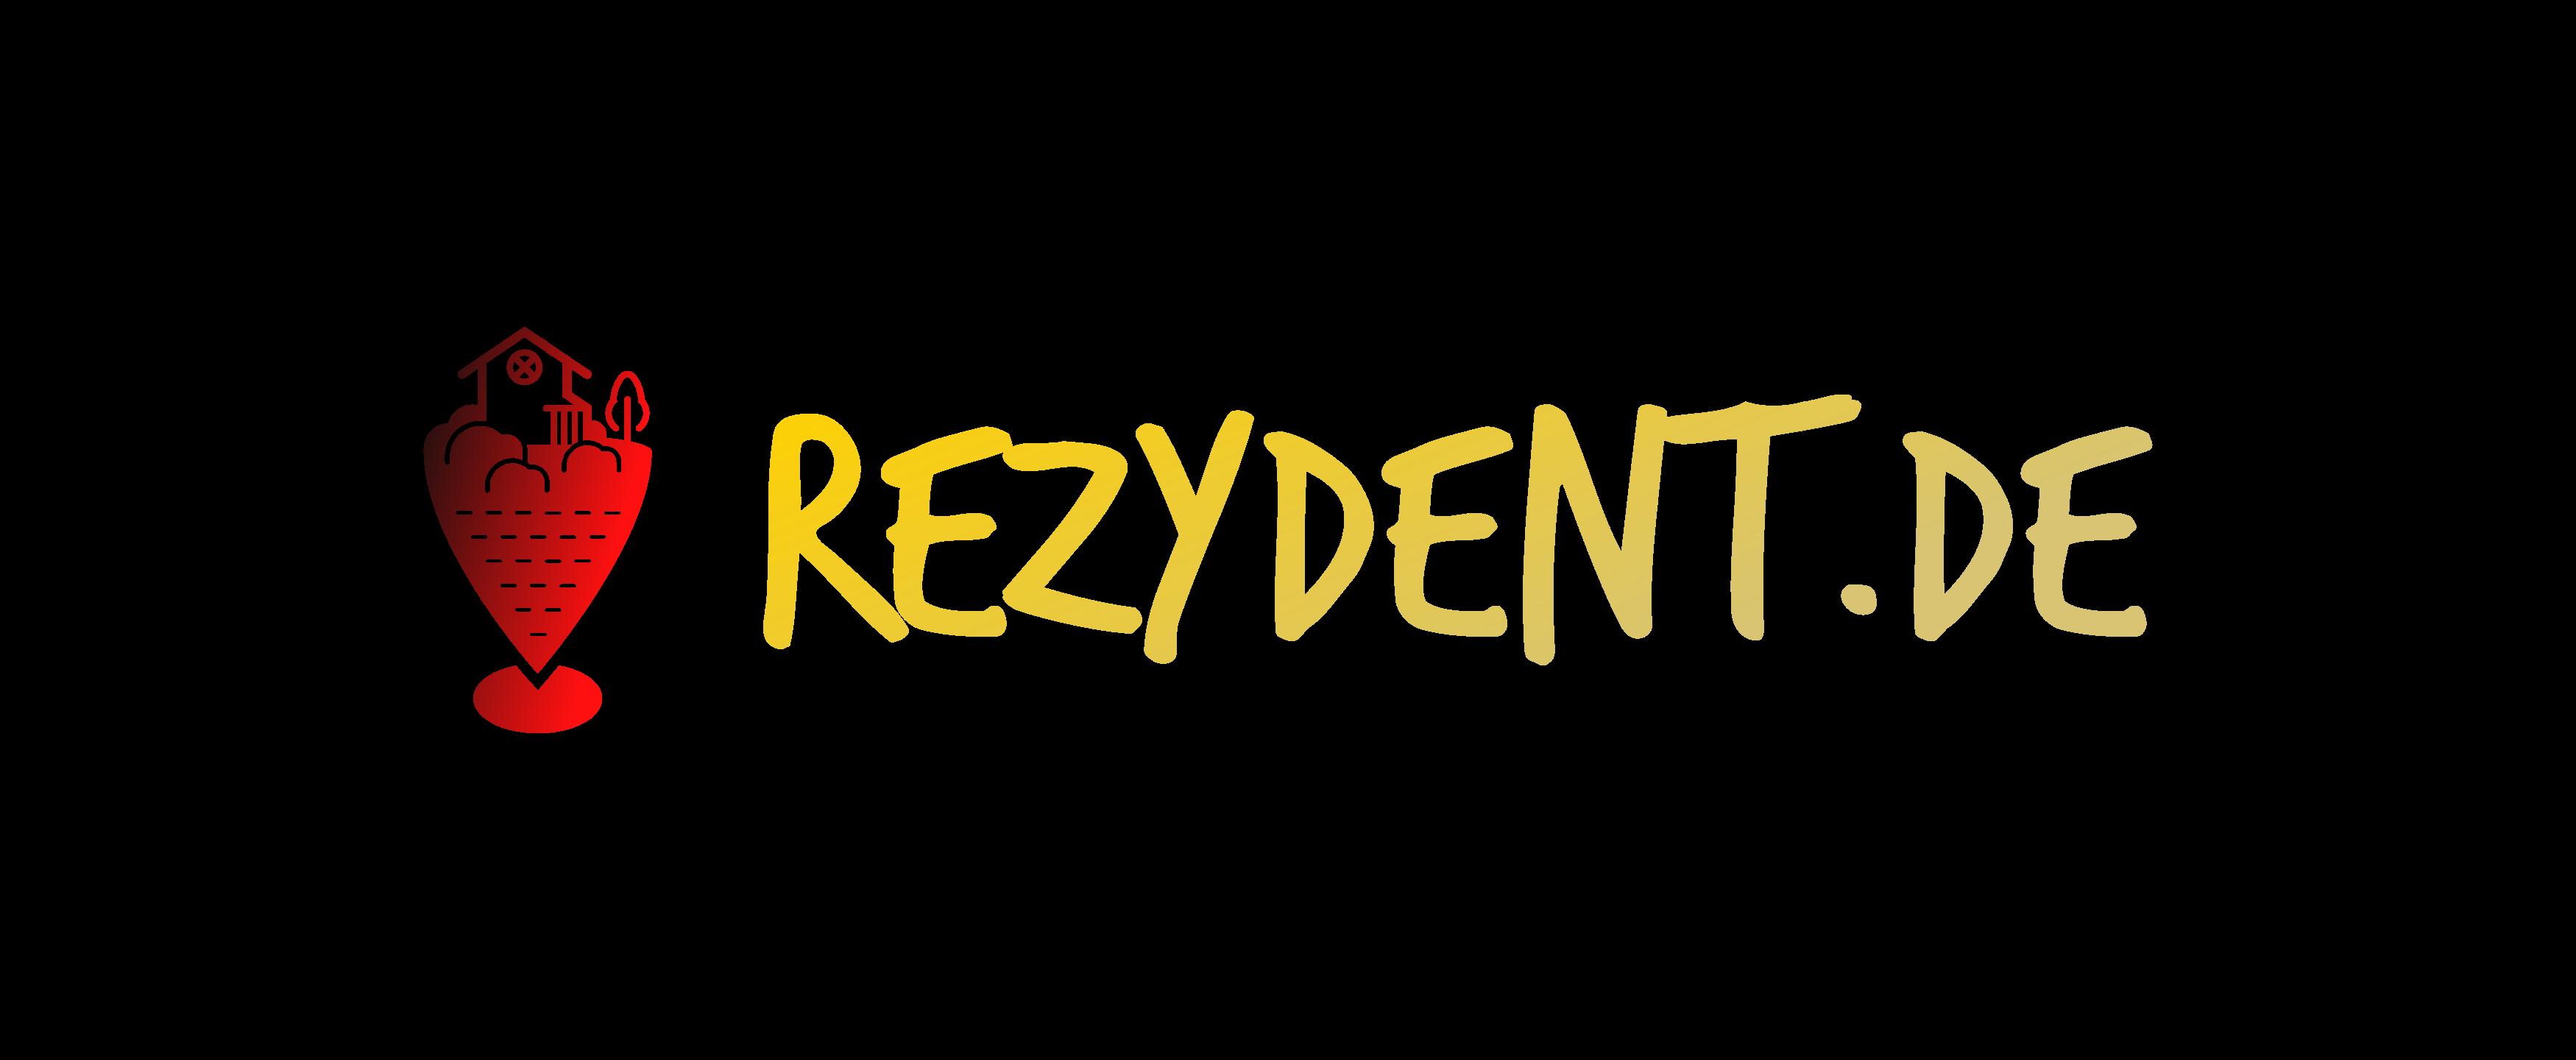 rezydent.de